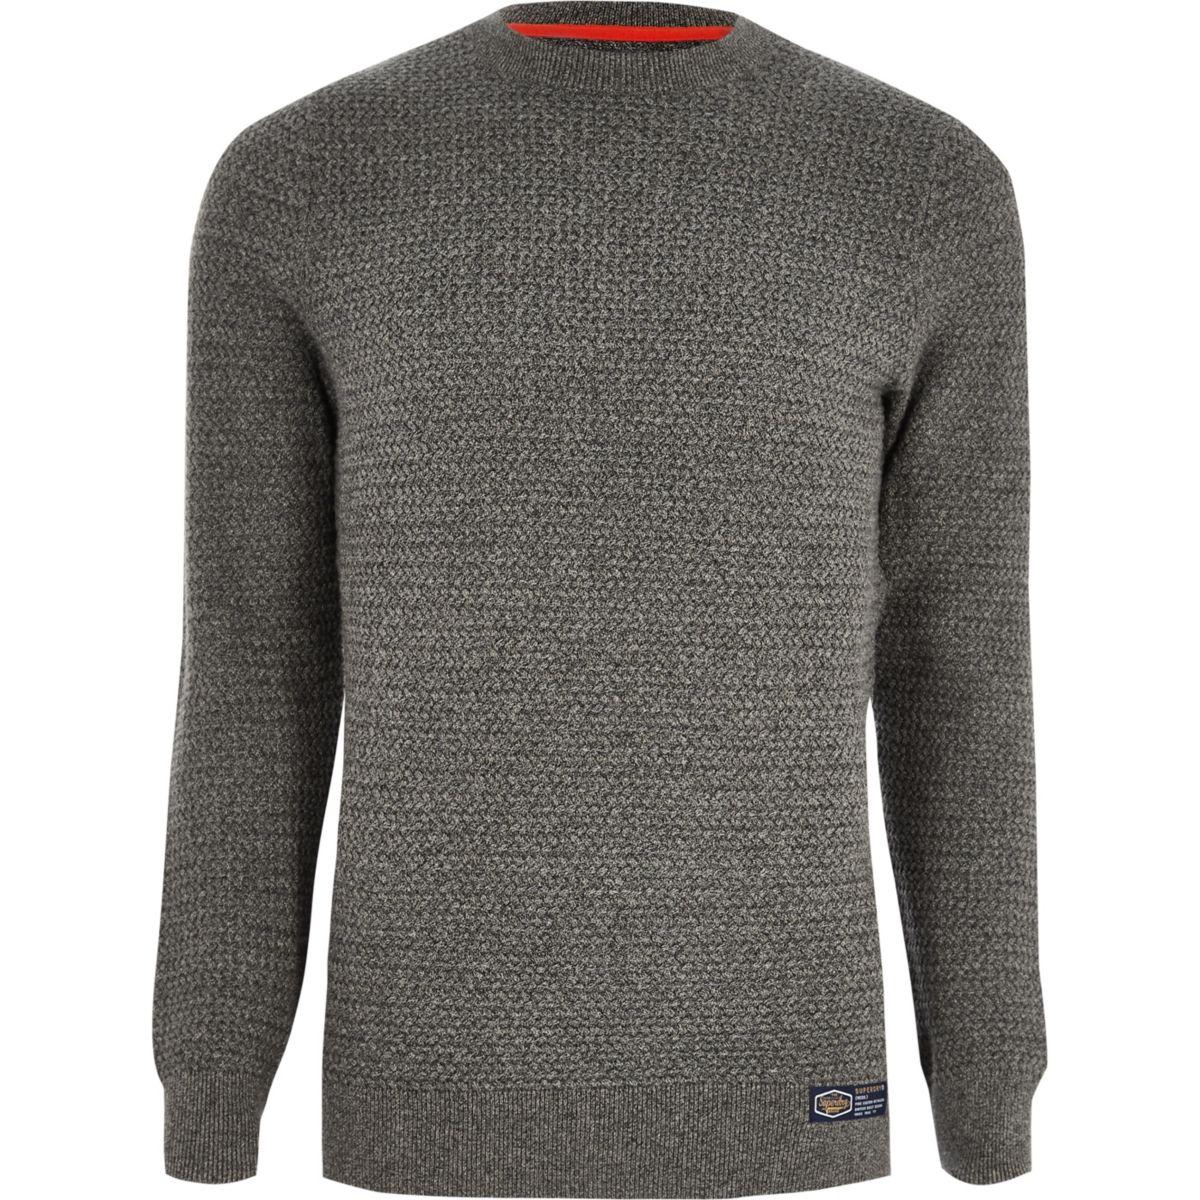 Superdry grey textured sweater